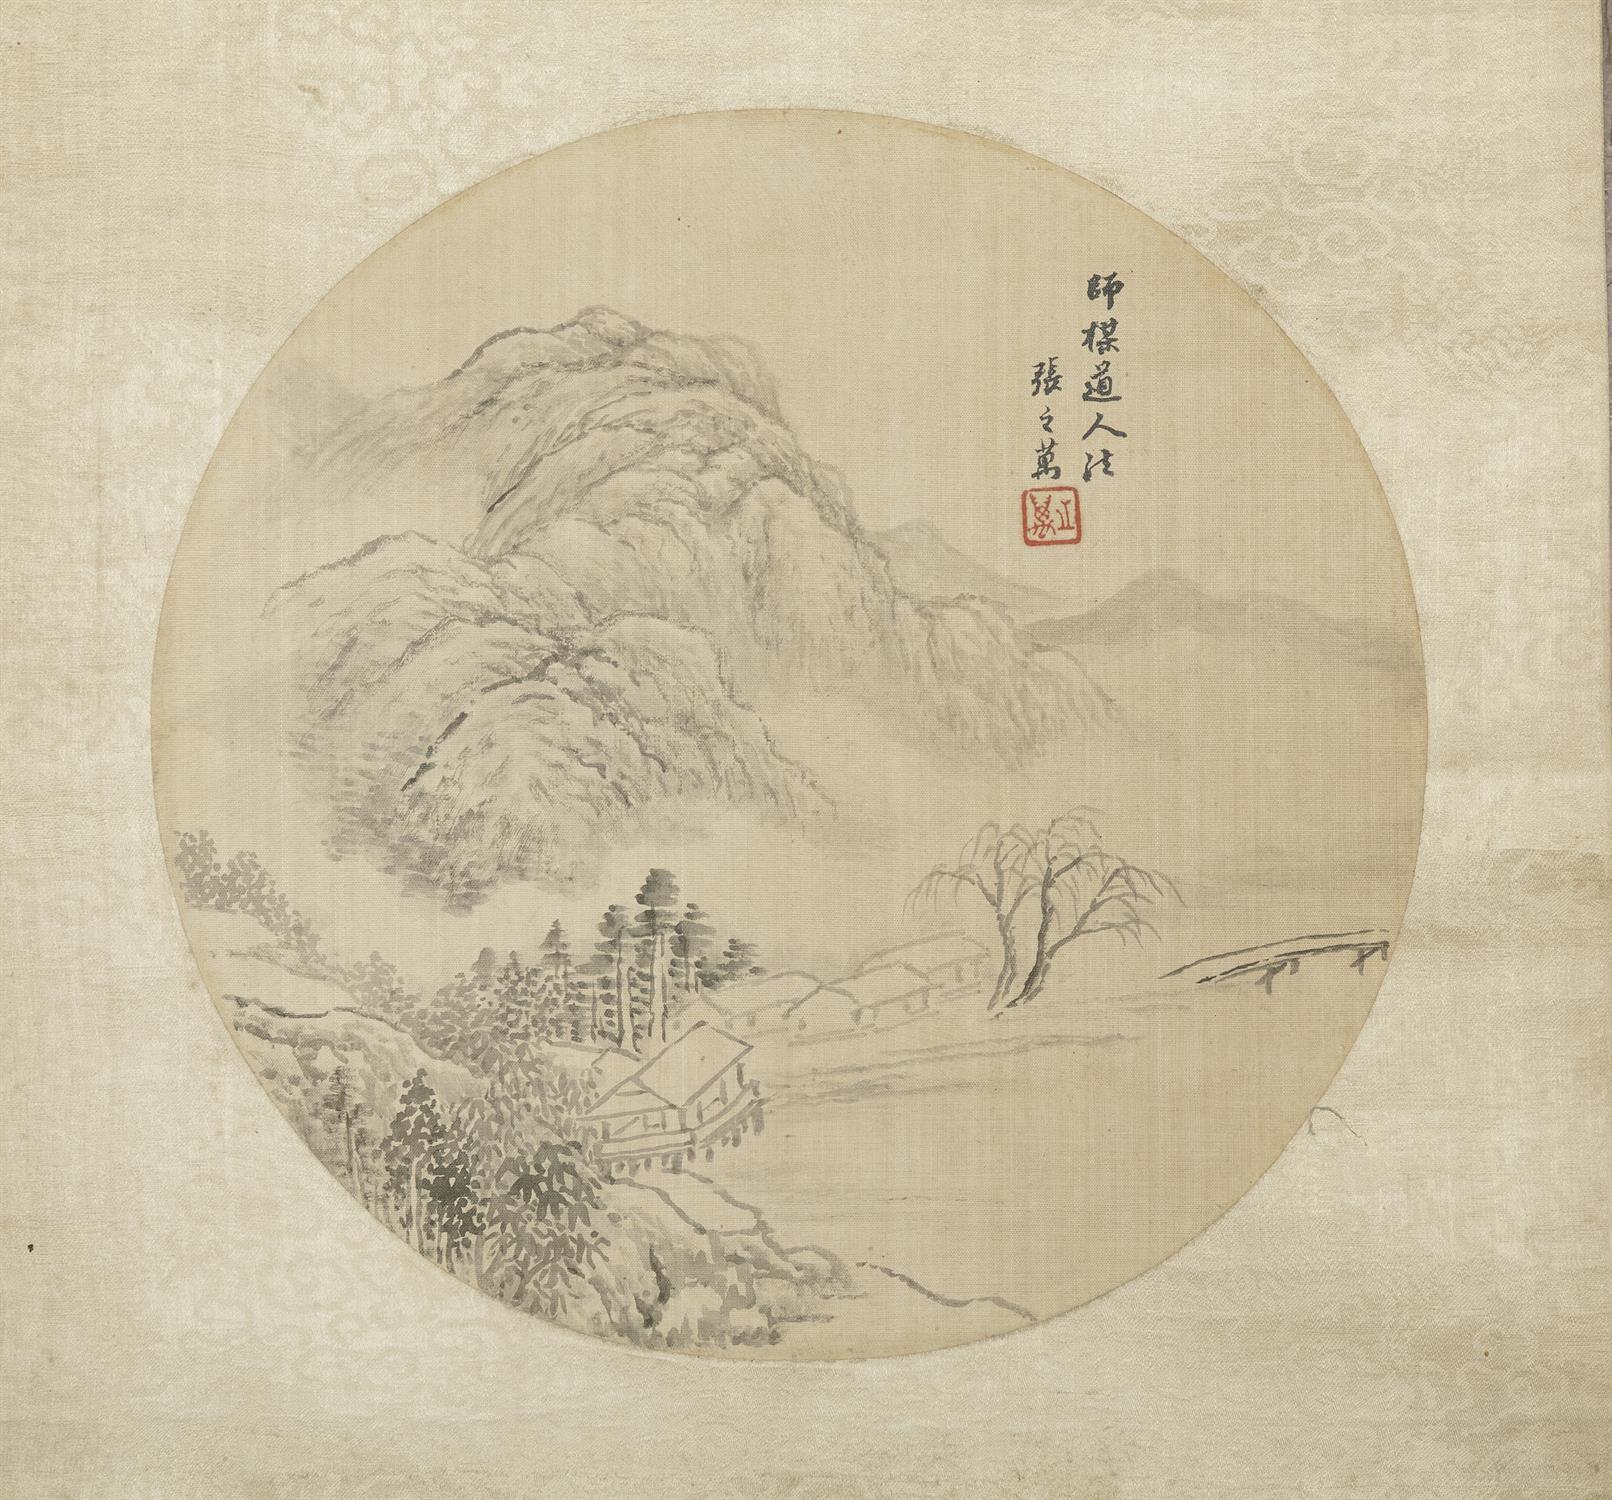 CHINESE SCHOOL, PAN ZENGYING 潘冬莹 (1808-1878), WENG TONGHE 翁同龢 (1830-1904) AND ZHANG ZHIWAN 张之万 ( - Image 3 of 8